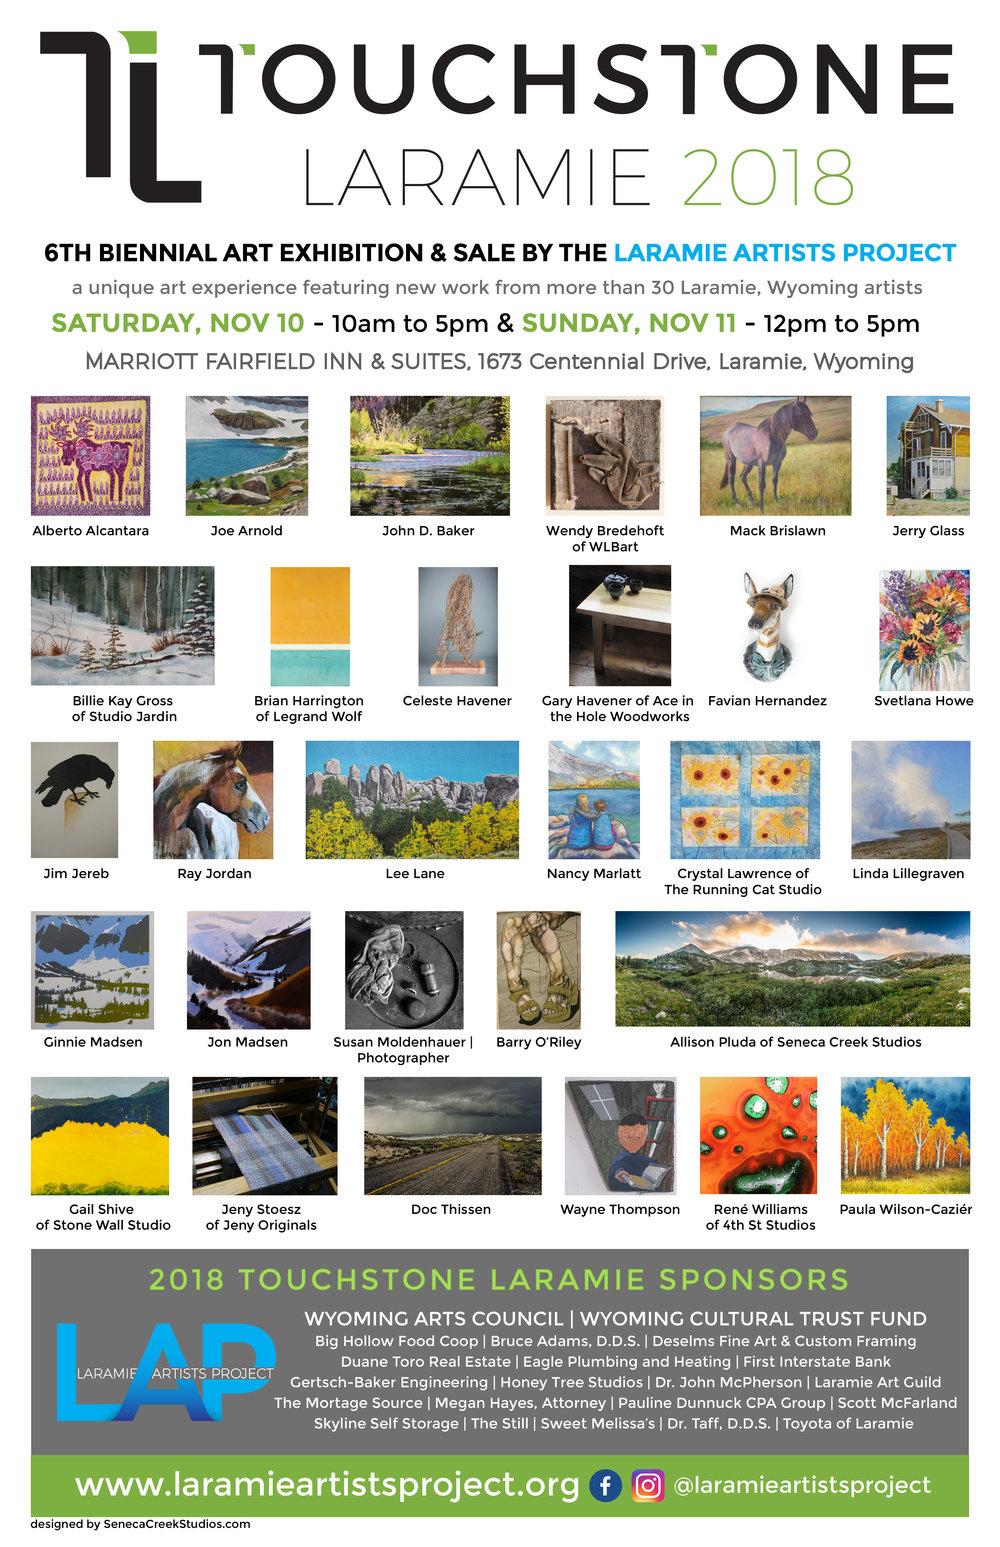 2018-Touchstone-Laramie-Poster-11-17-WEB.jpg